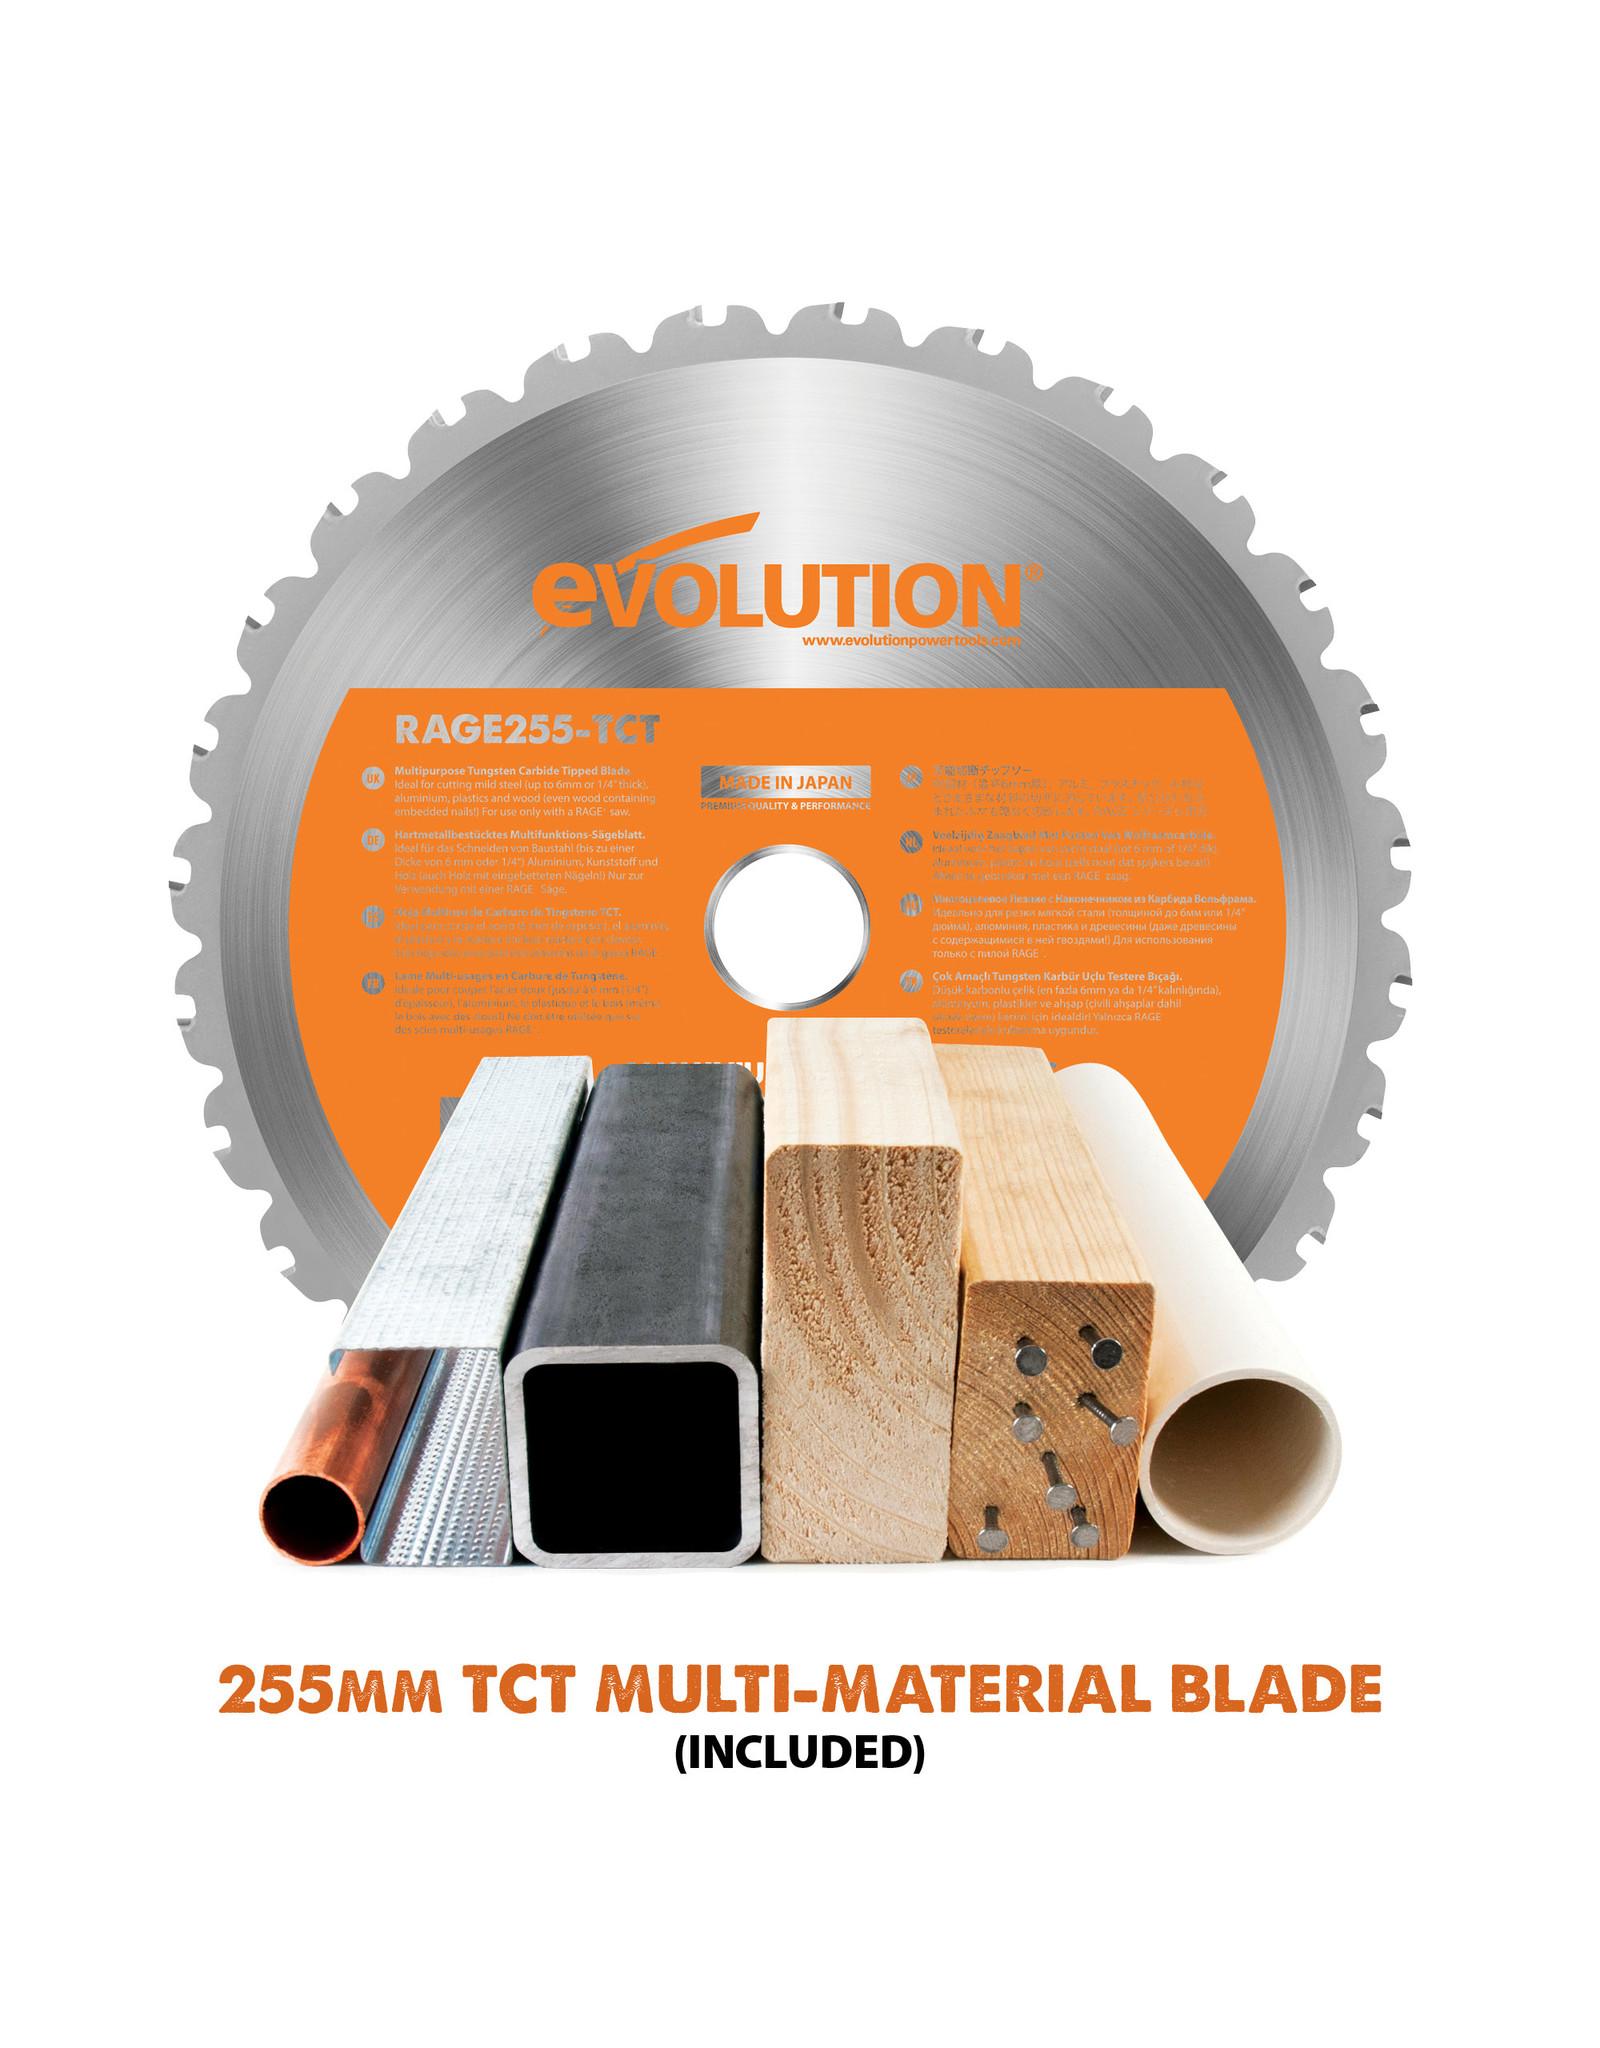 Evolution Power Tools Build Line MULTIFUNCTIONELE VERSTEKZAAG RAGE R255 SMS+